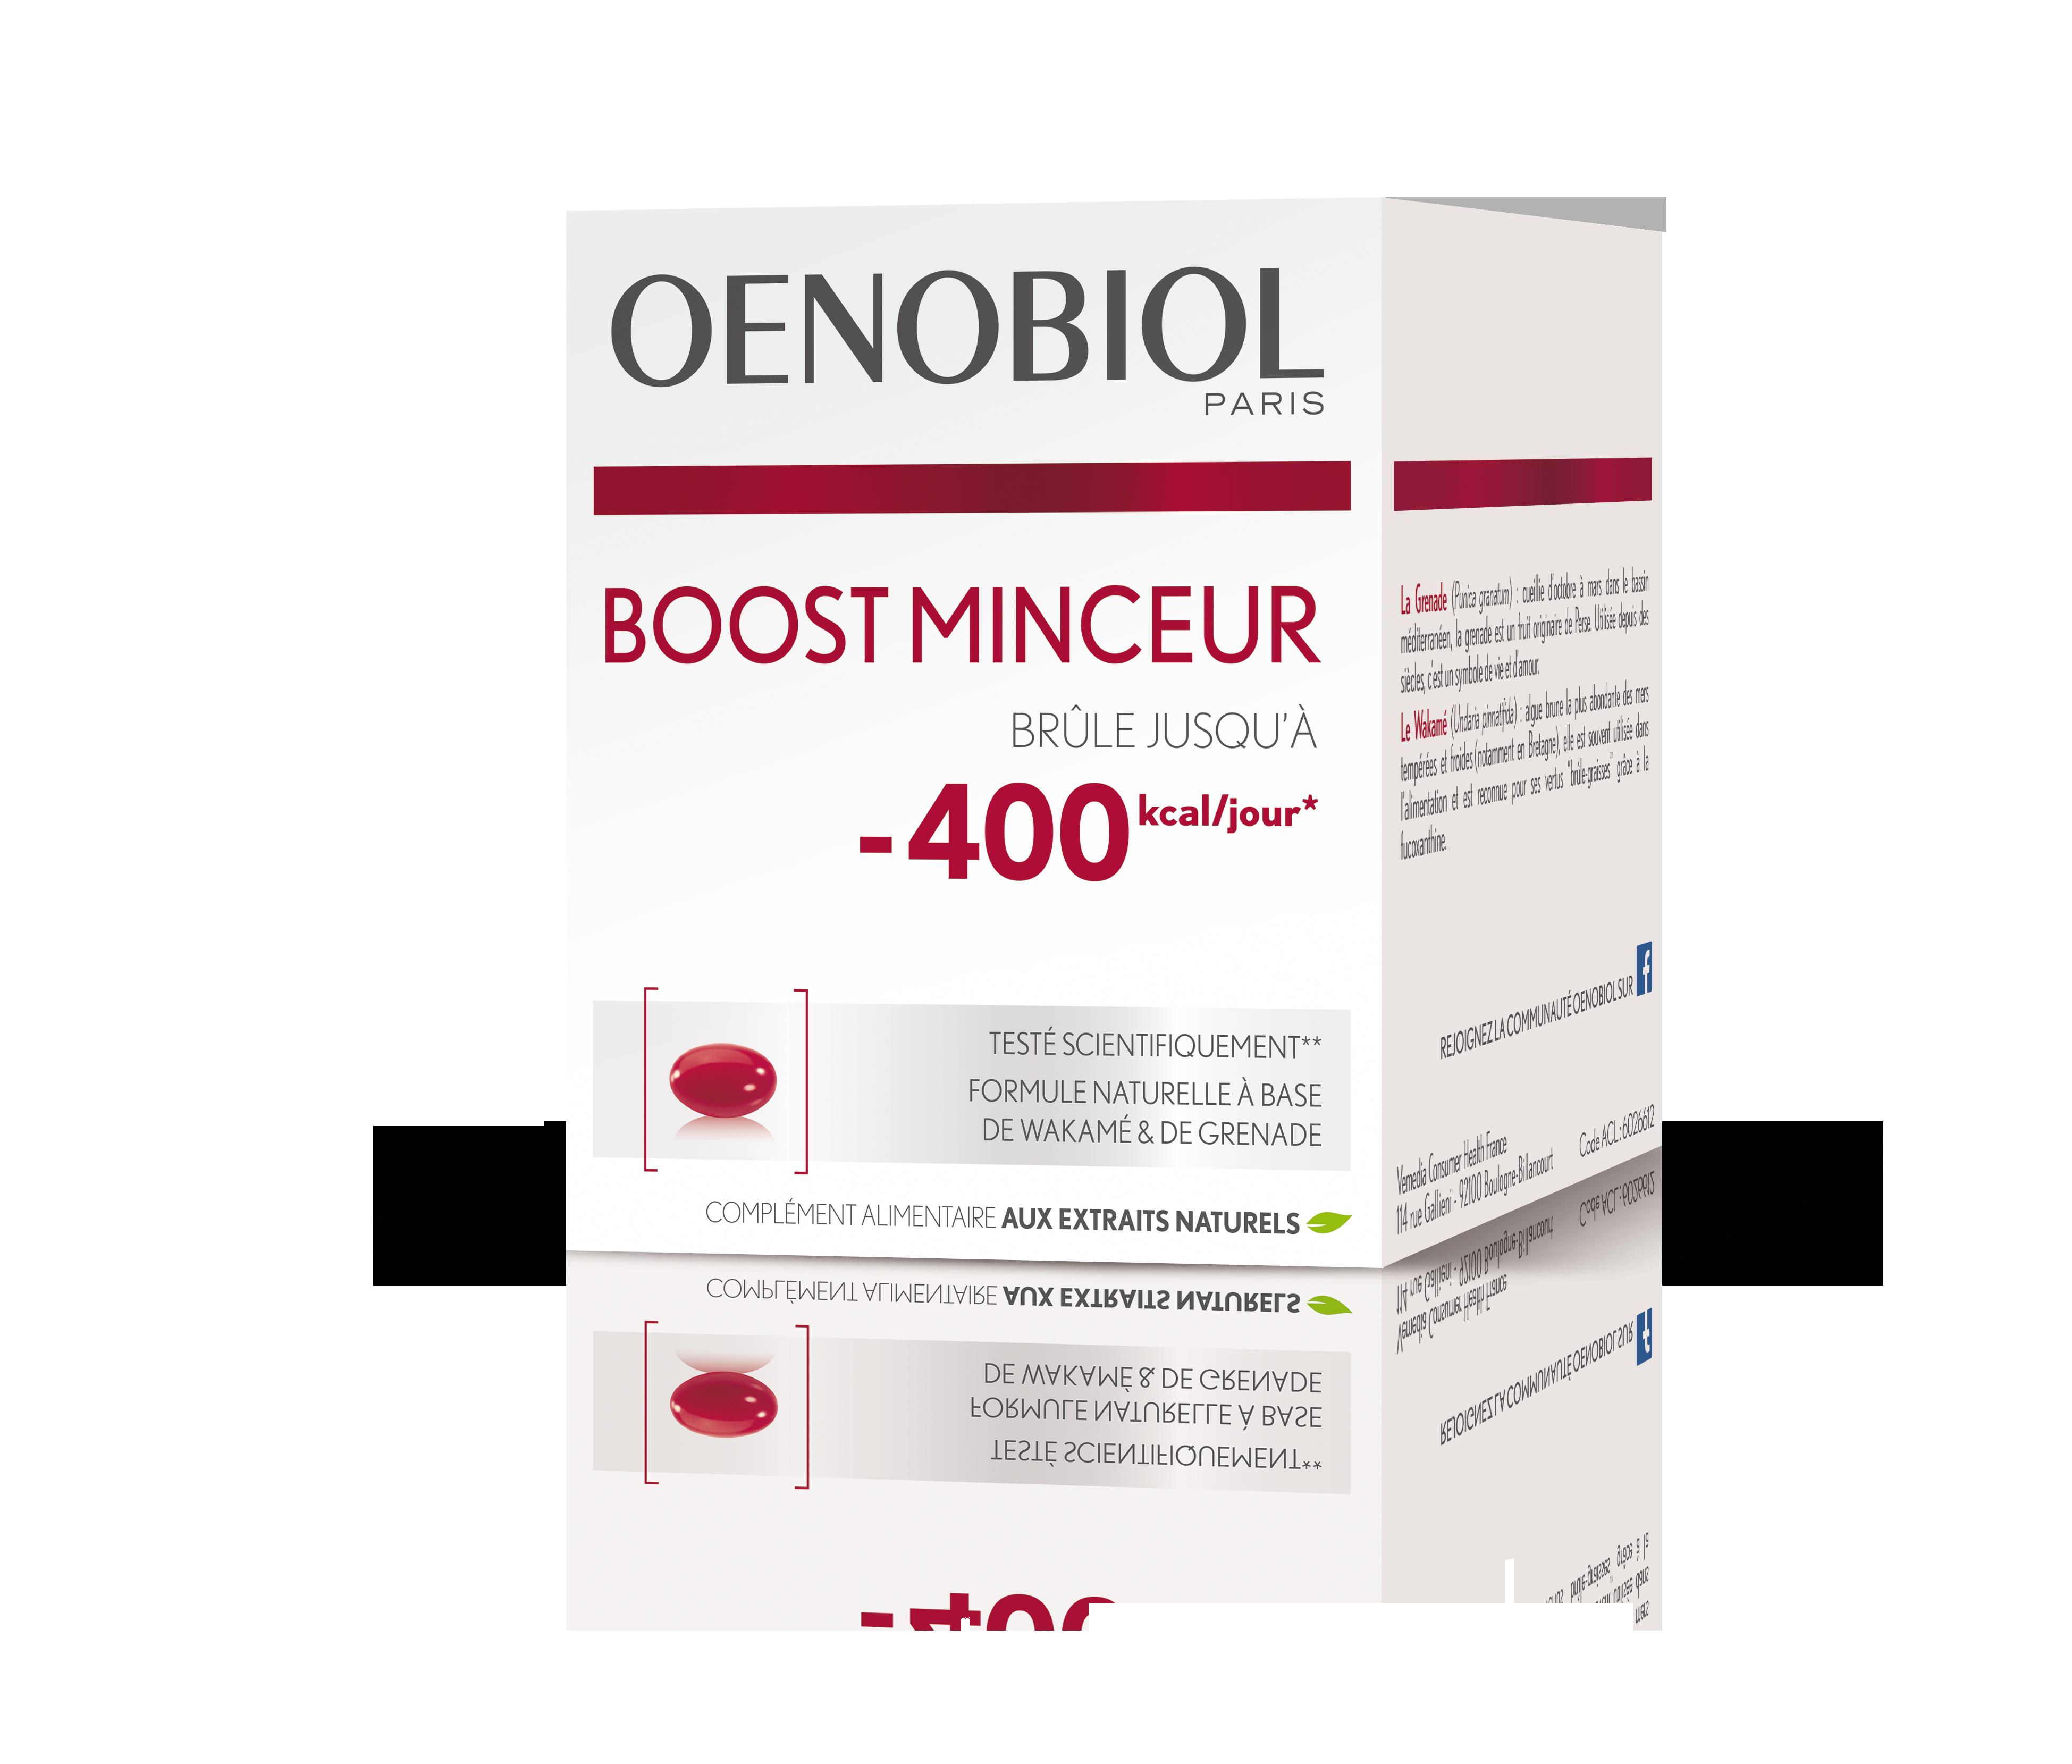 OENOBIOL BOOST MINCEUR 3D_3000px_HD